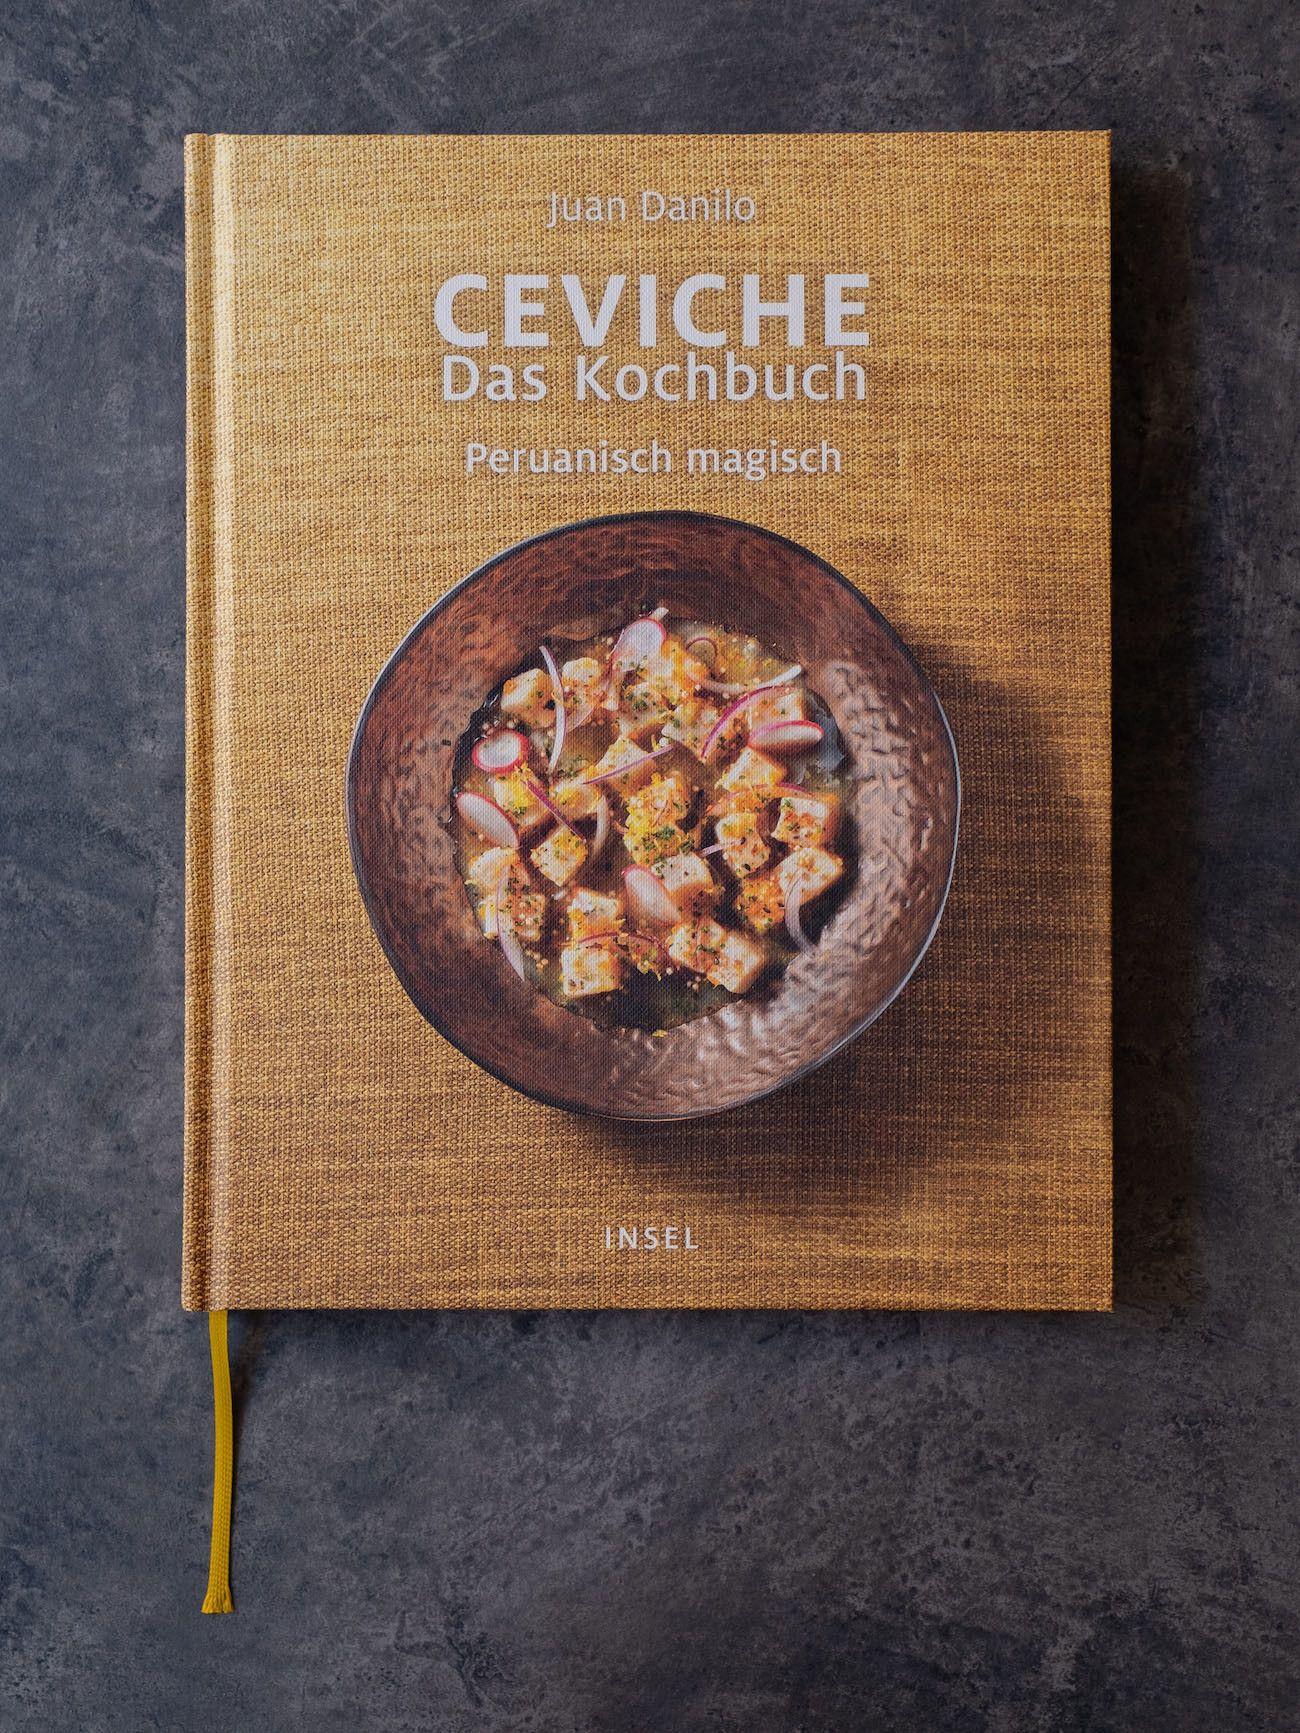 Foodblog, About Fuel, CEVICHE Das Kochbuch, Juan Danilo, Buchcover